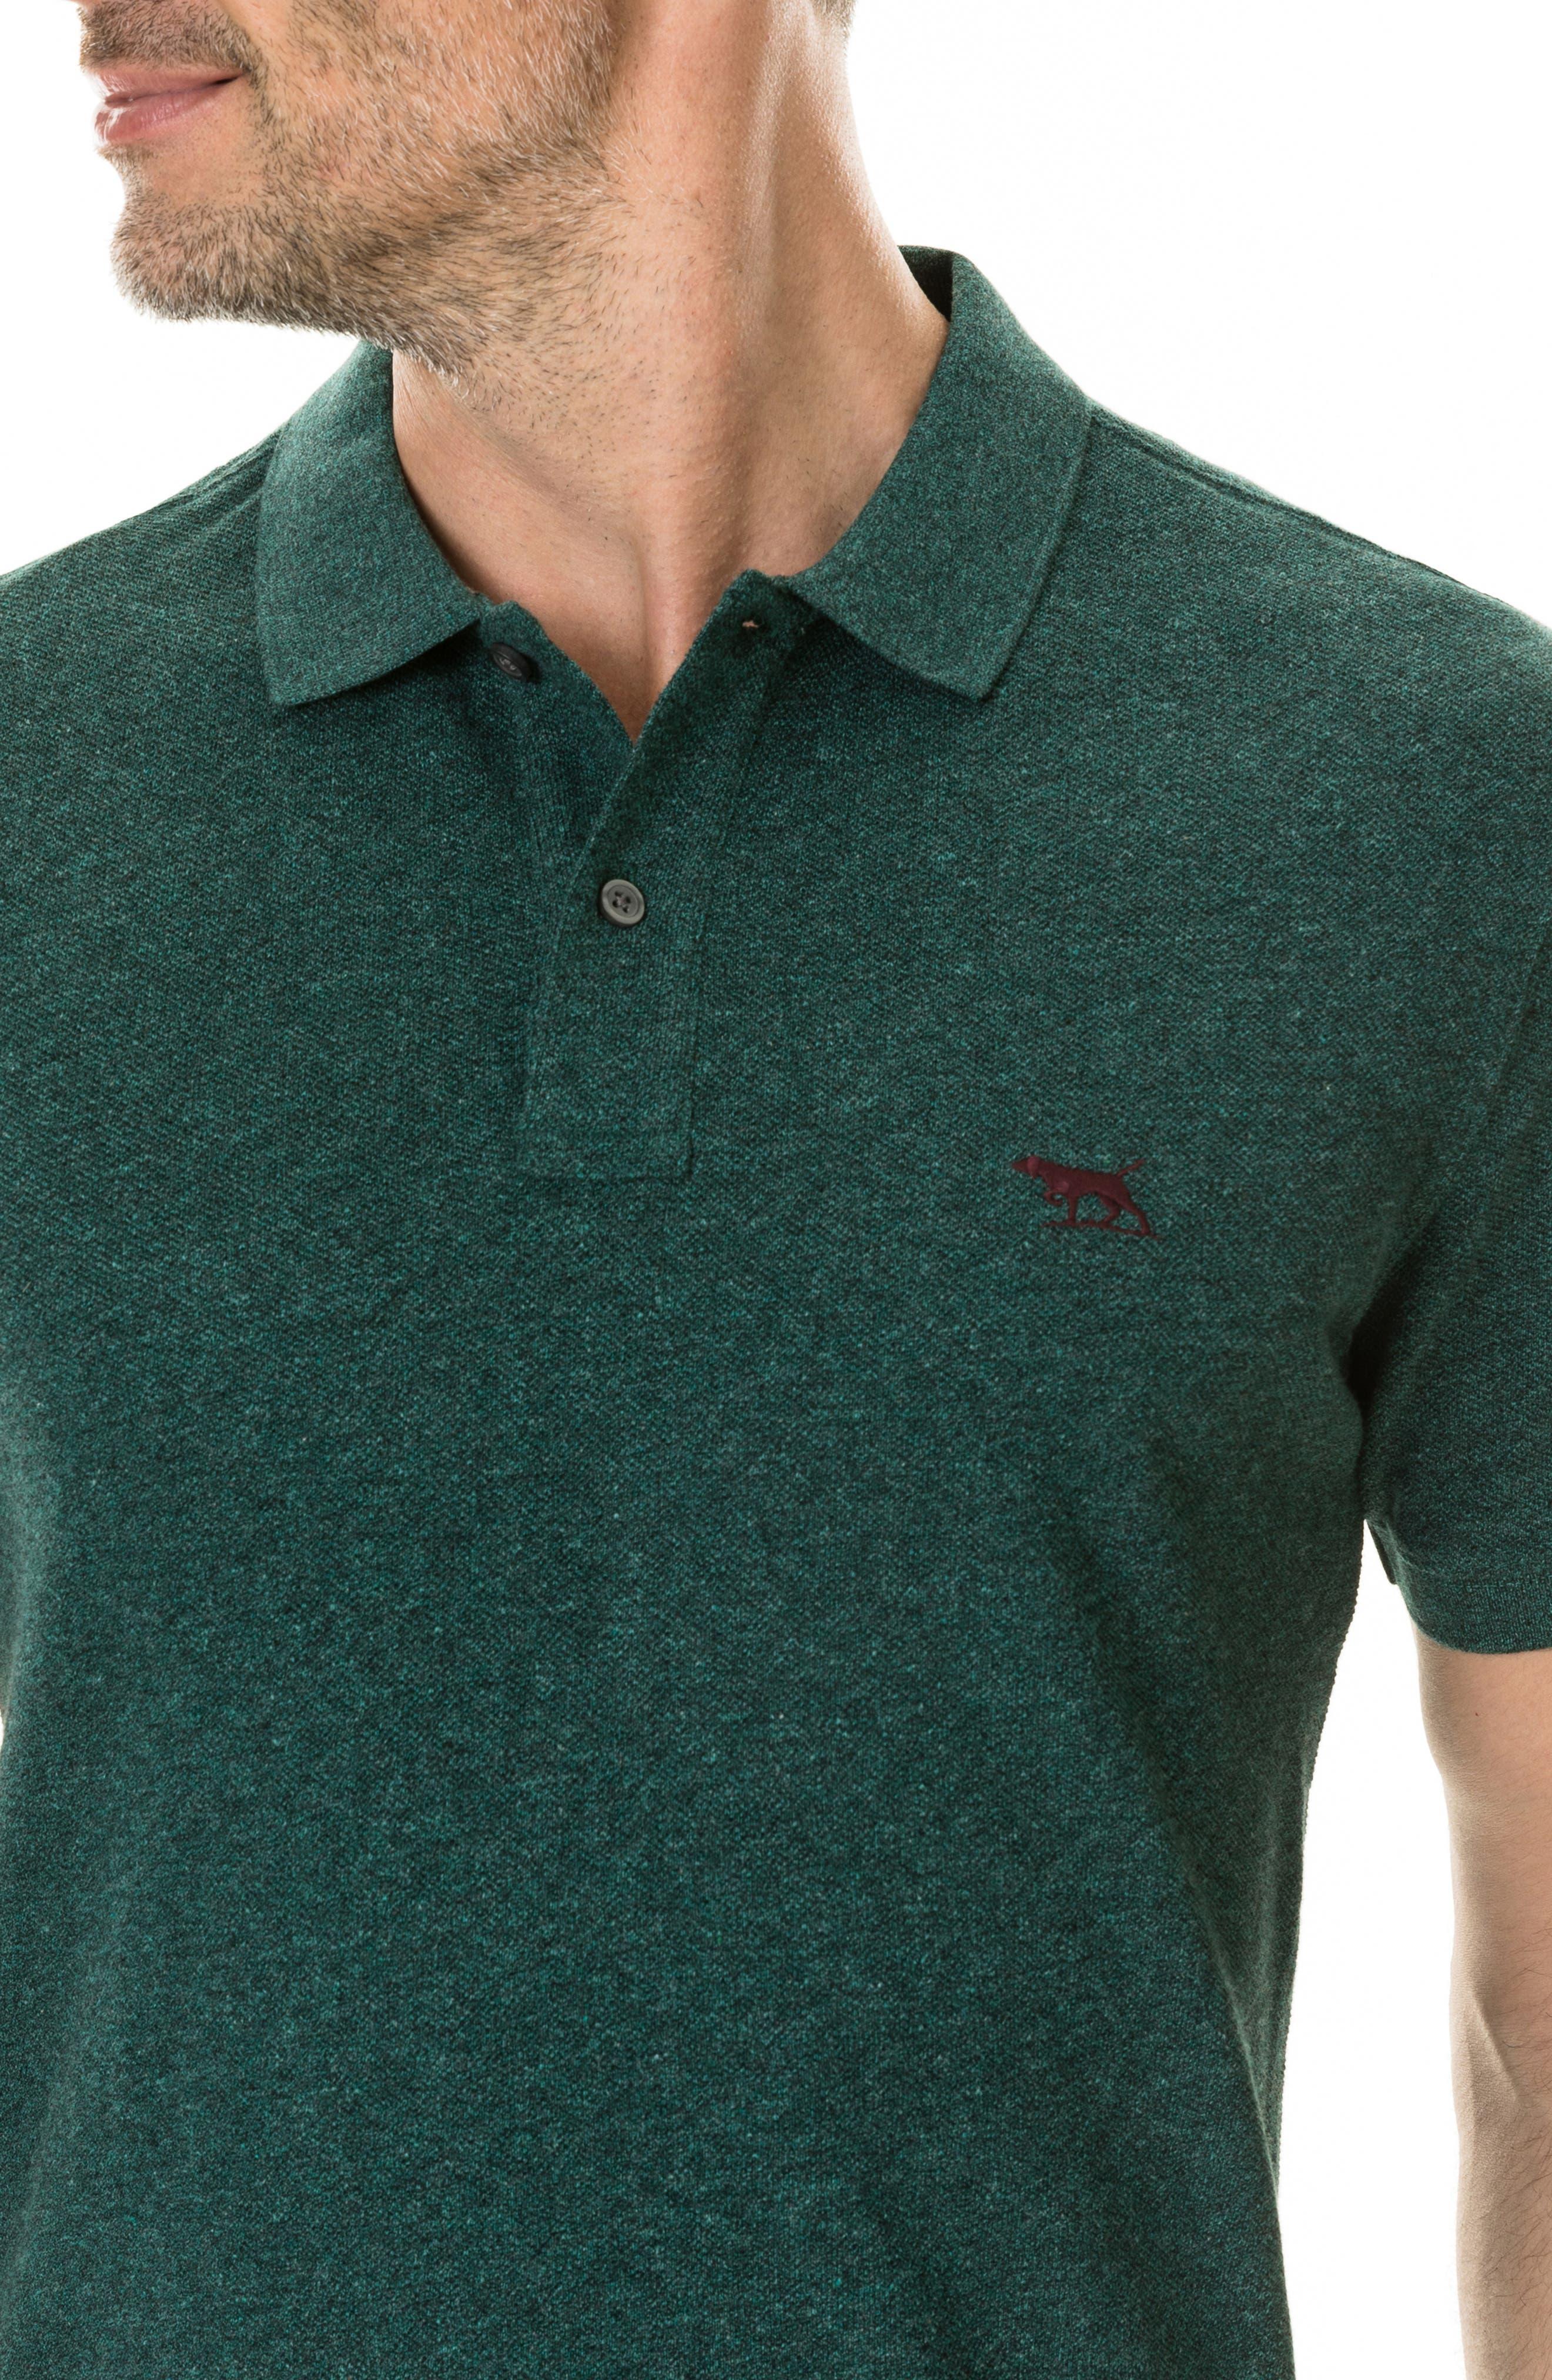 'The Gunn' Piqué Sports Fit Cotton Polo,                             Alternate thumbnail 4, color,                             PINE